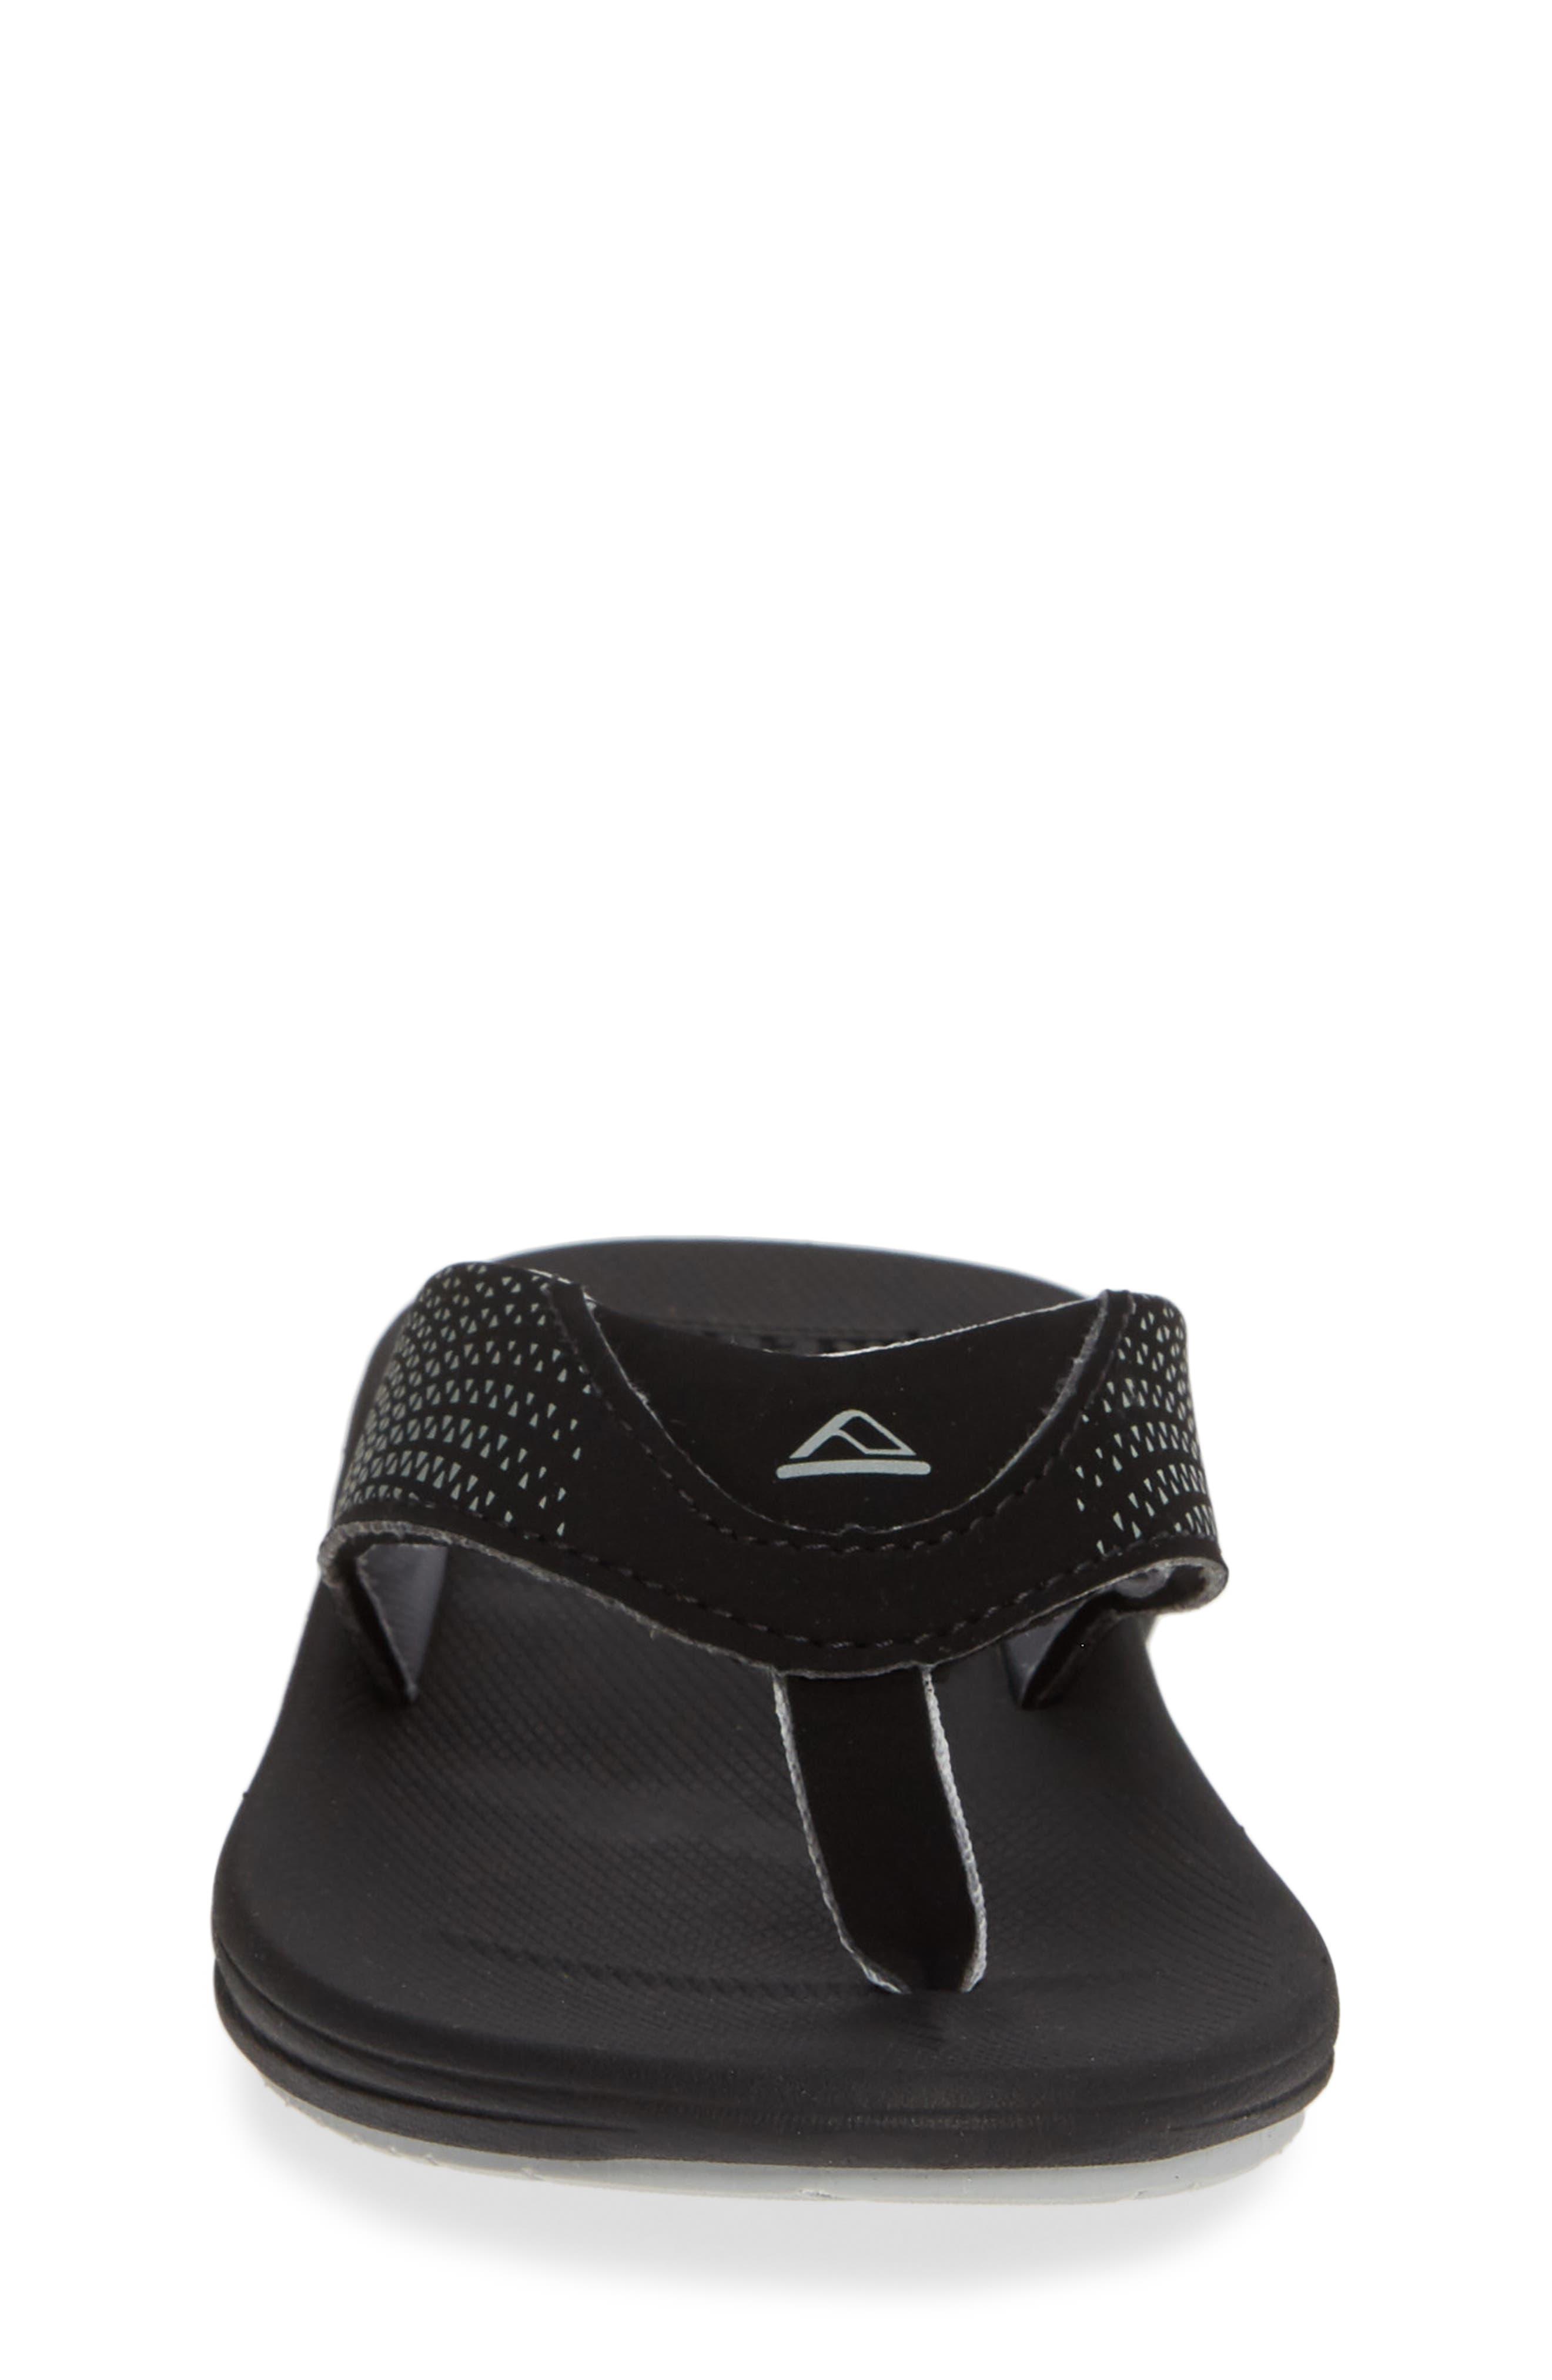 REEF, Grom Rover Water Friendly Sandal, Alternate thumbnail 4, color, BLACK